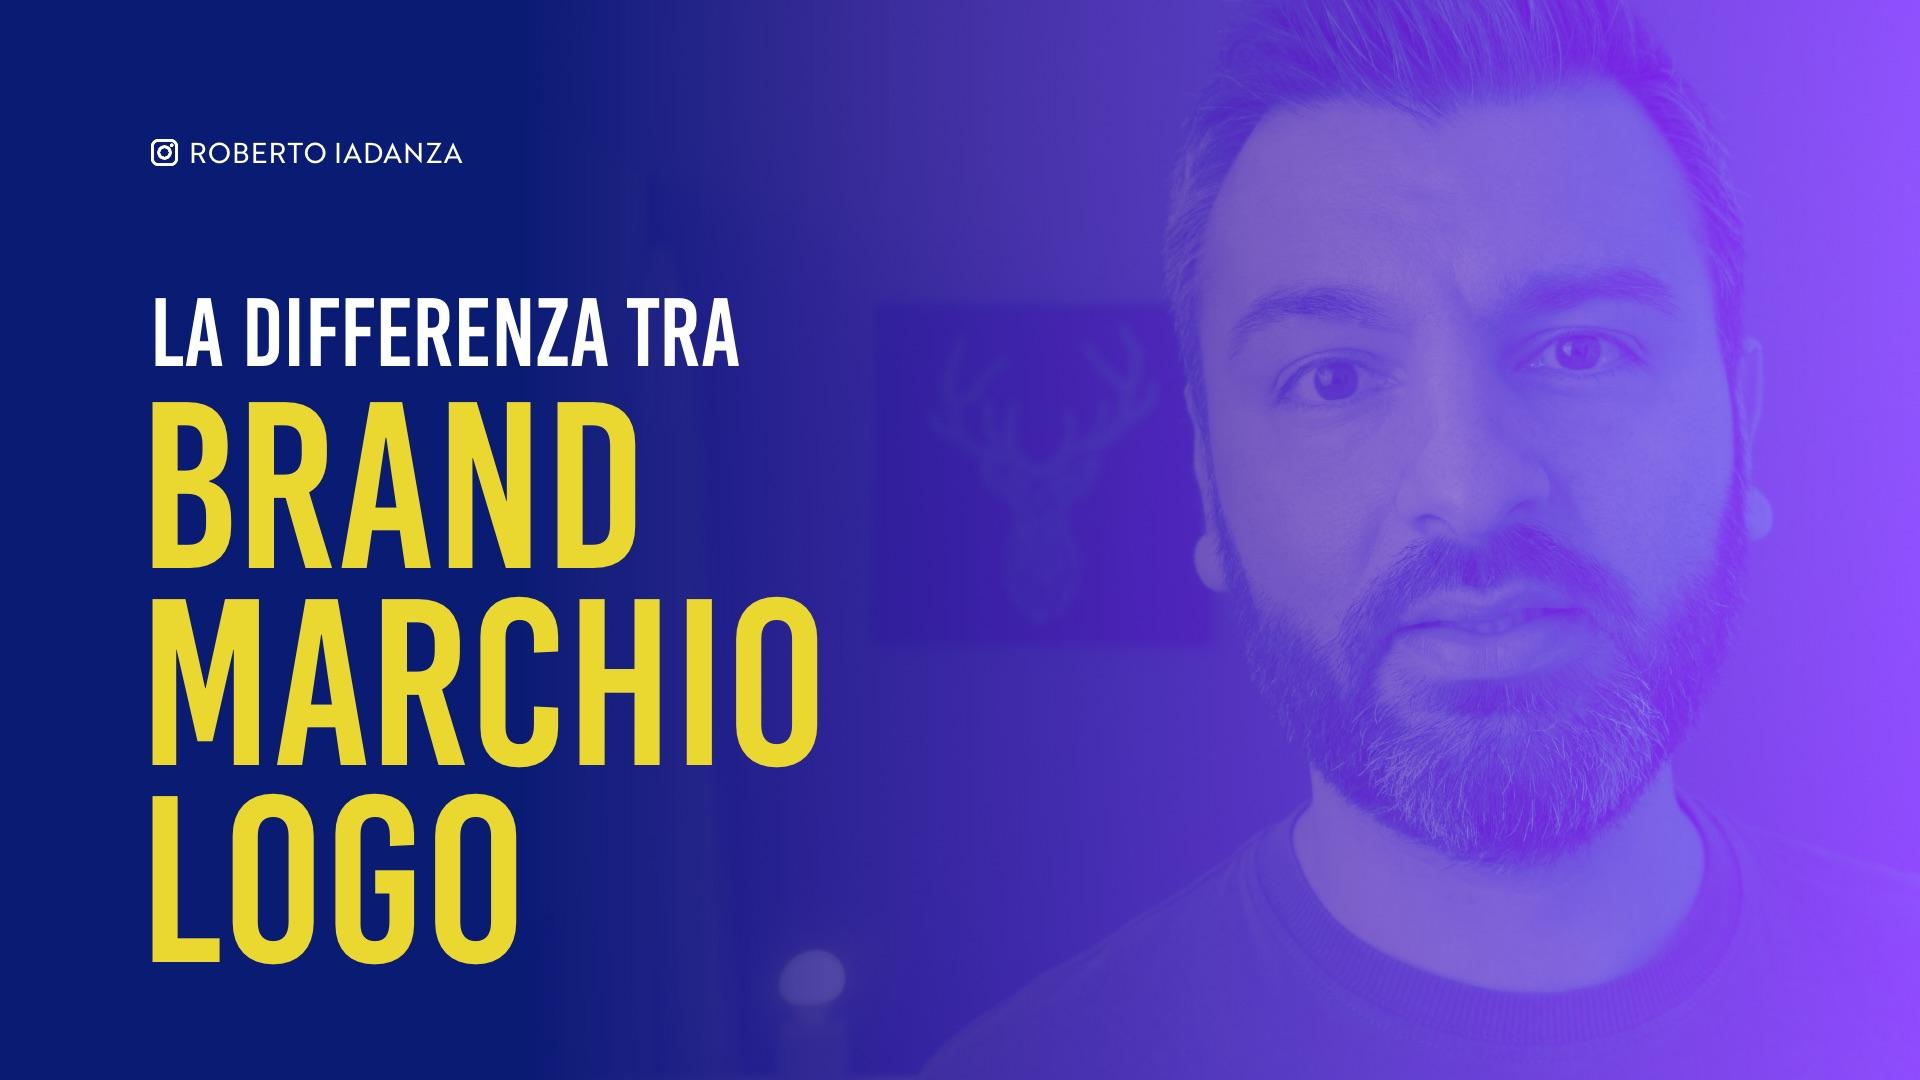 Brand Marchio Logo Logotipo